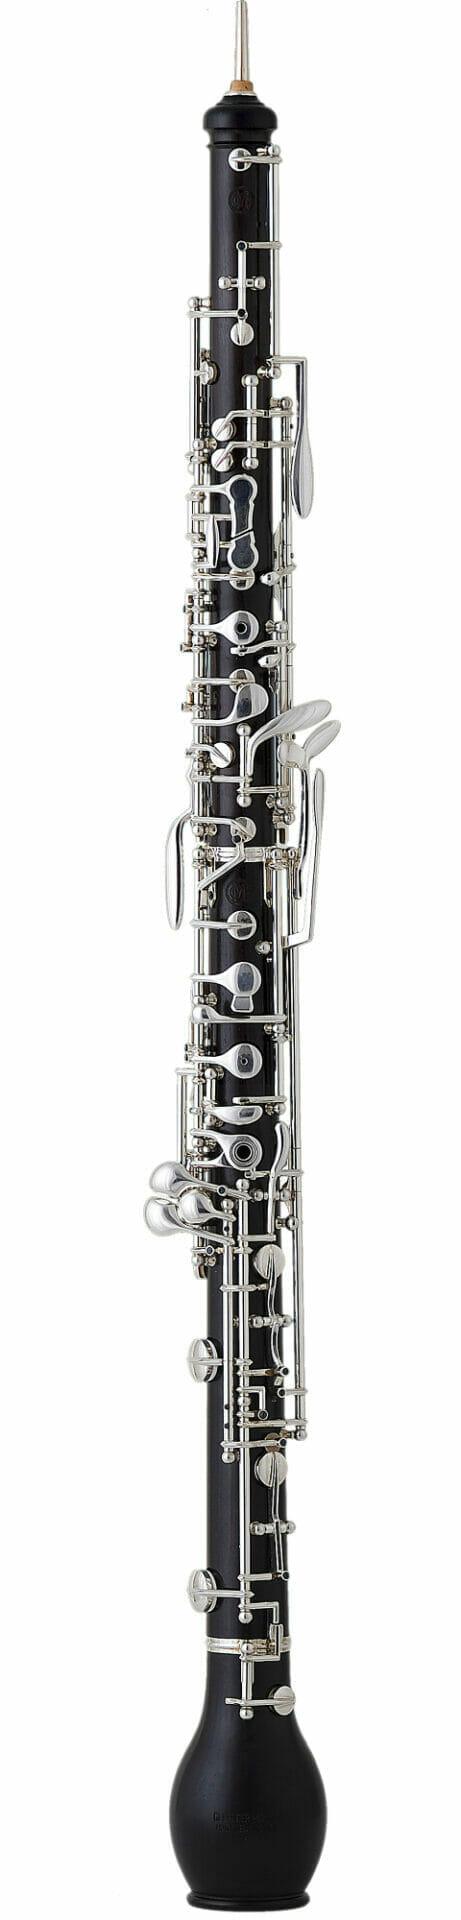 Mod. 170 Solist